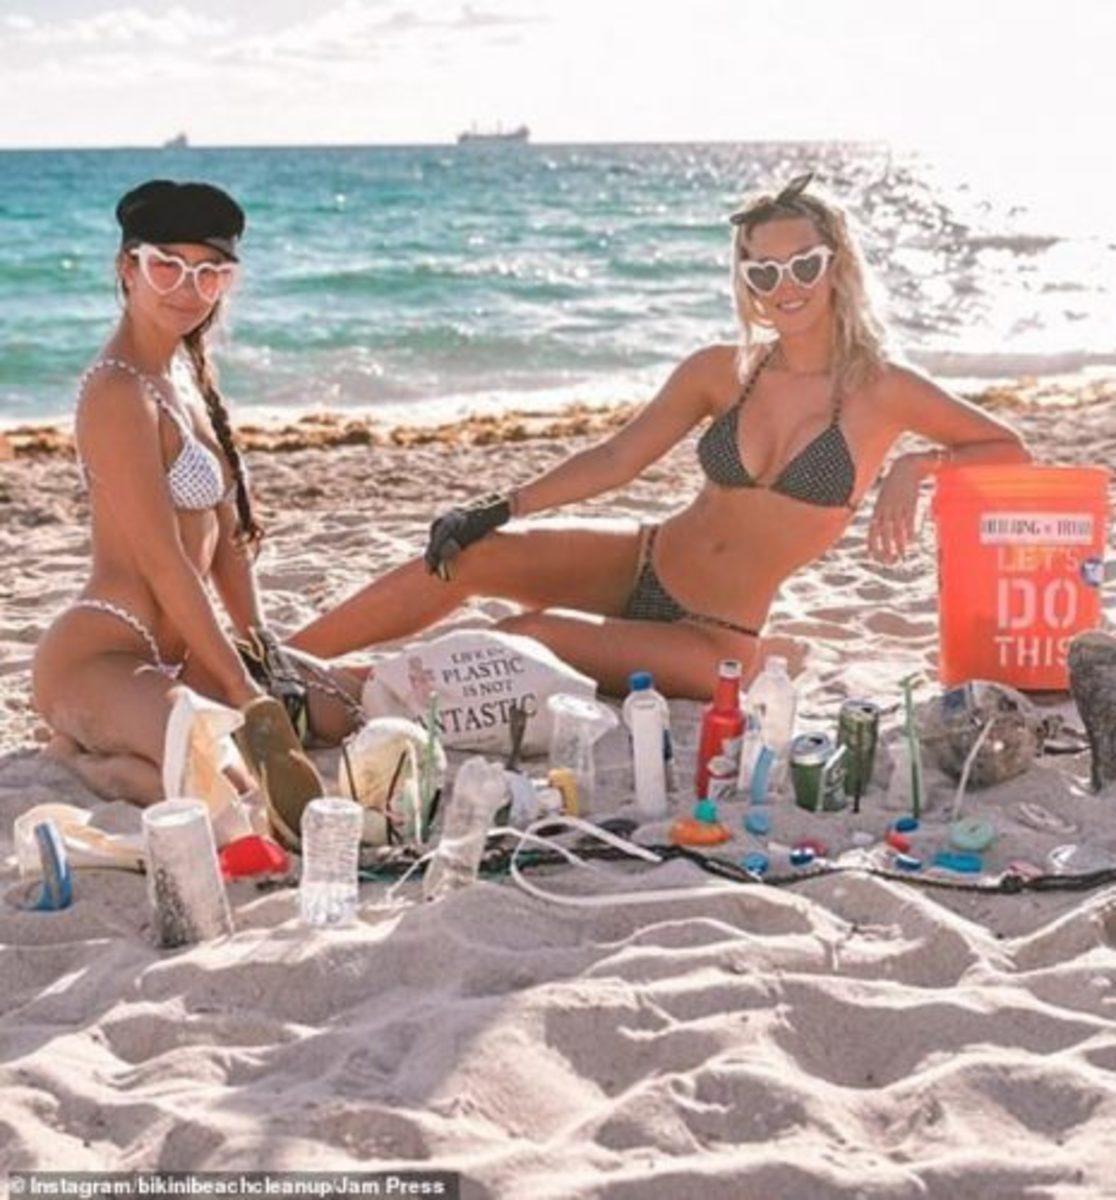 bikini-beach-cleanup-5-465x500